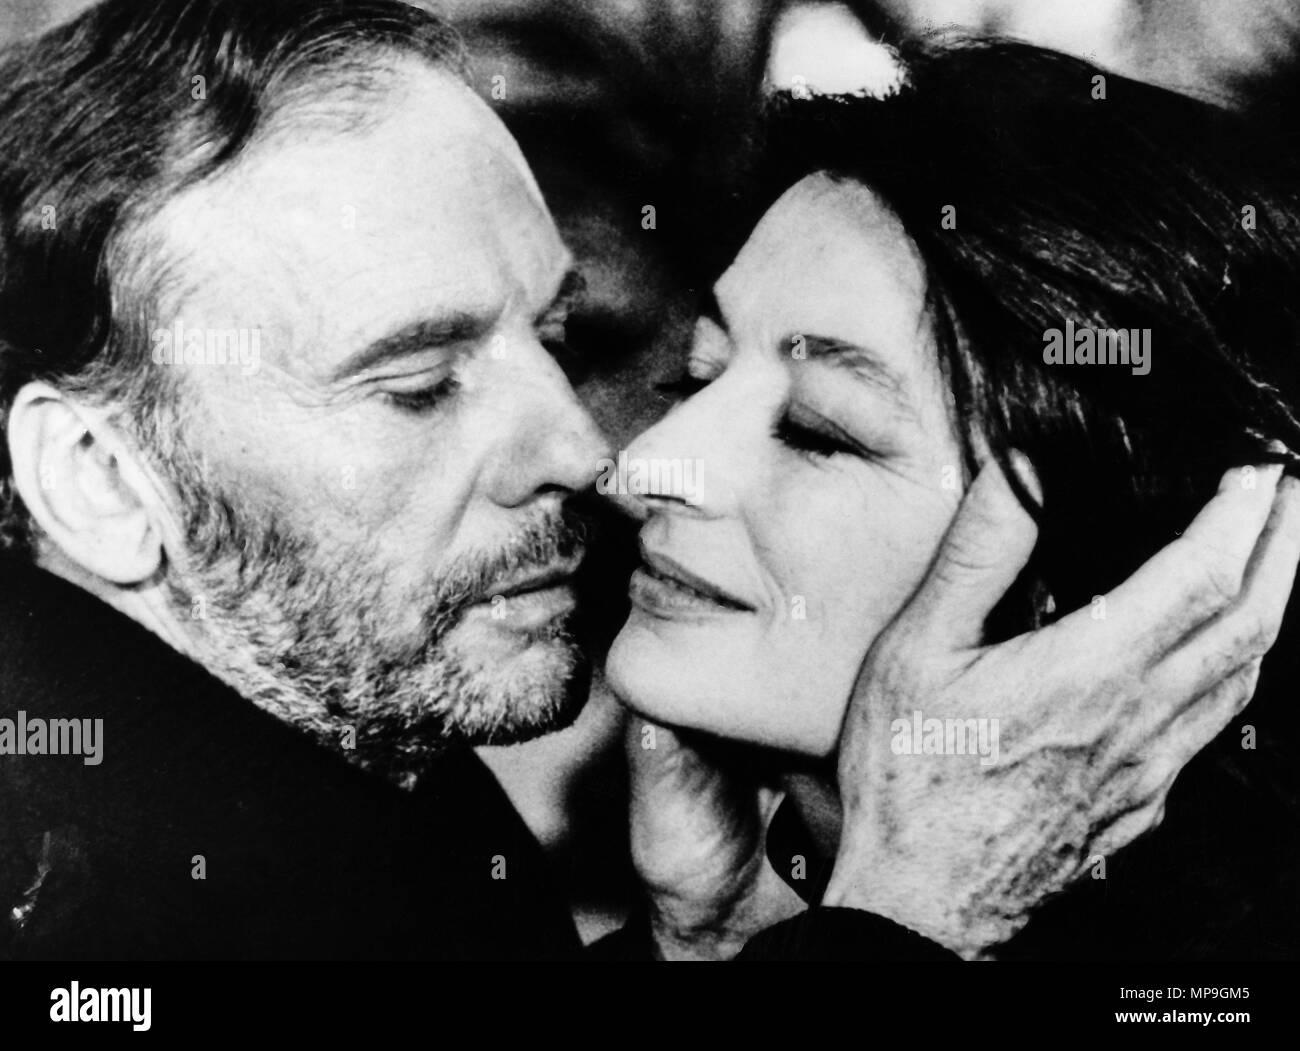 Anouk Aimee, Jean Louis trintignant, un uomo una donna oggi, 1986 Stockbild